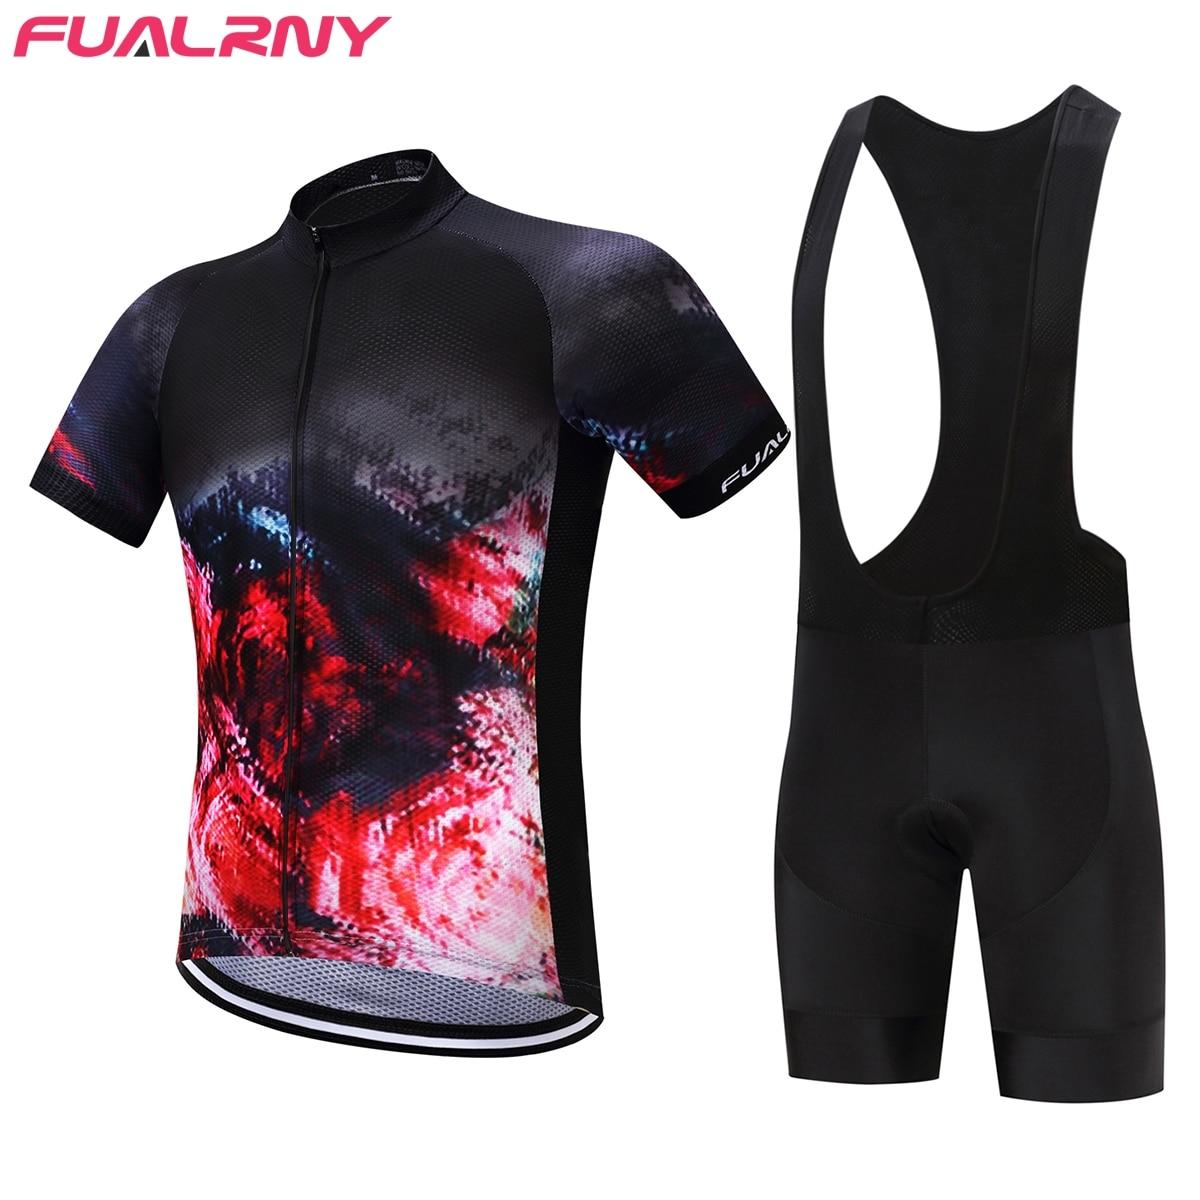 FUALRNY Calder Pro Maillot Rock Bicycle Wear MTB Cycling Clothing Ropa Ciclismo Bike uniform Cycle shirt Racing Cycling Jersey